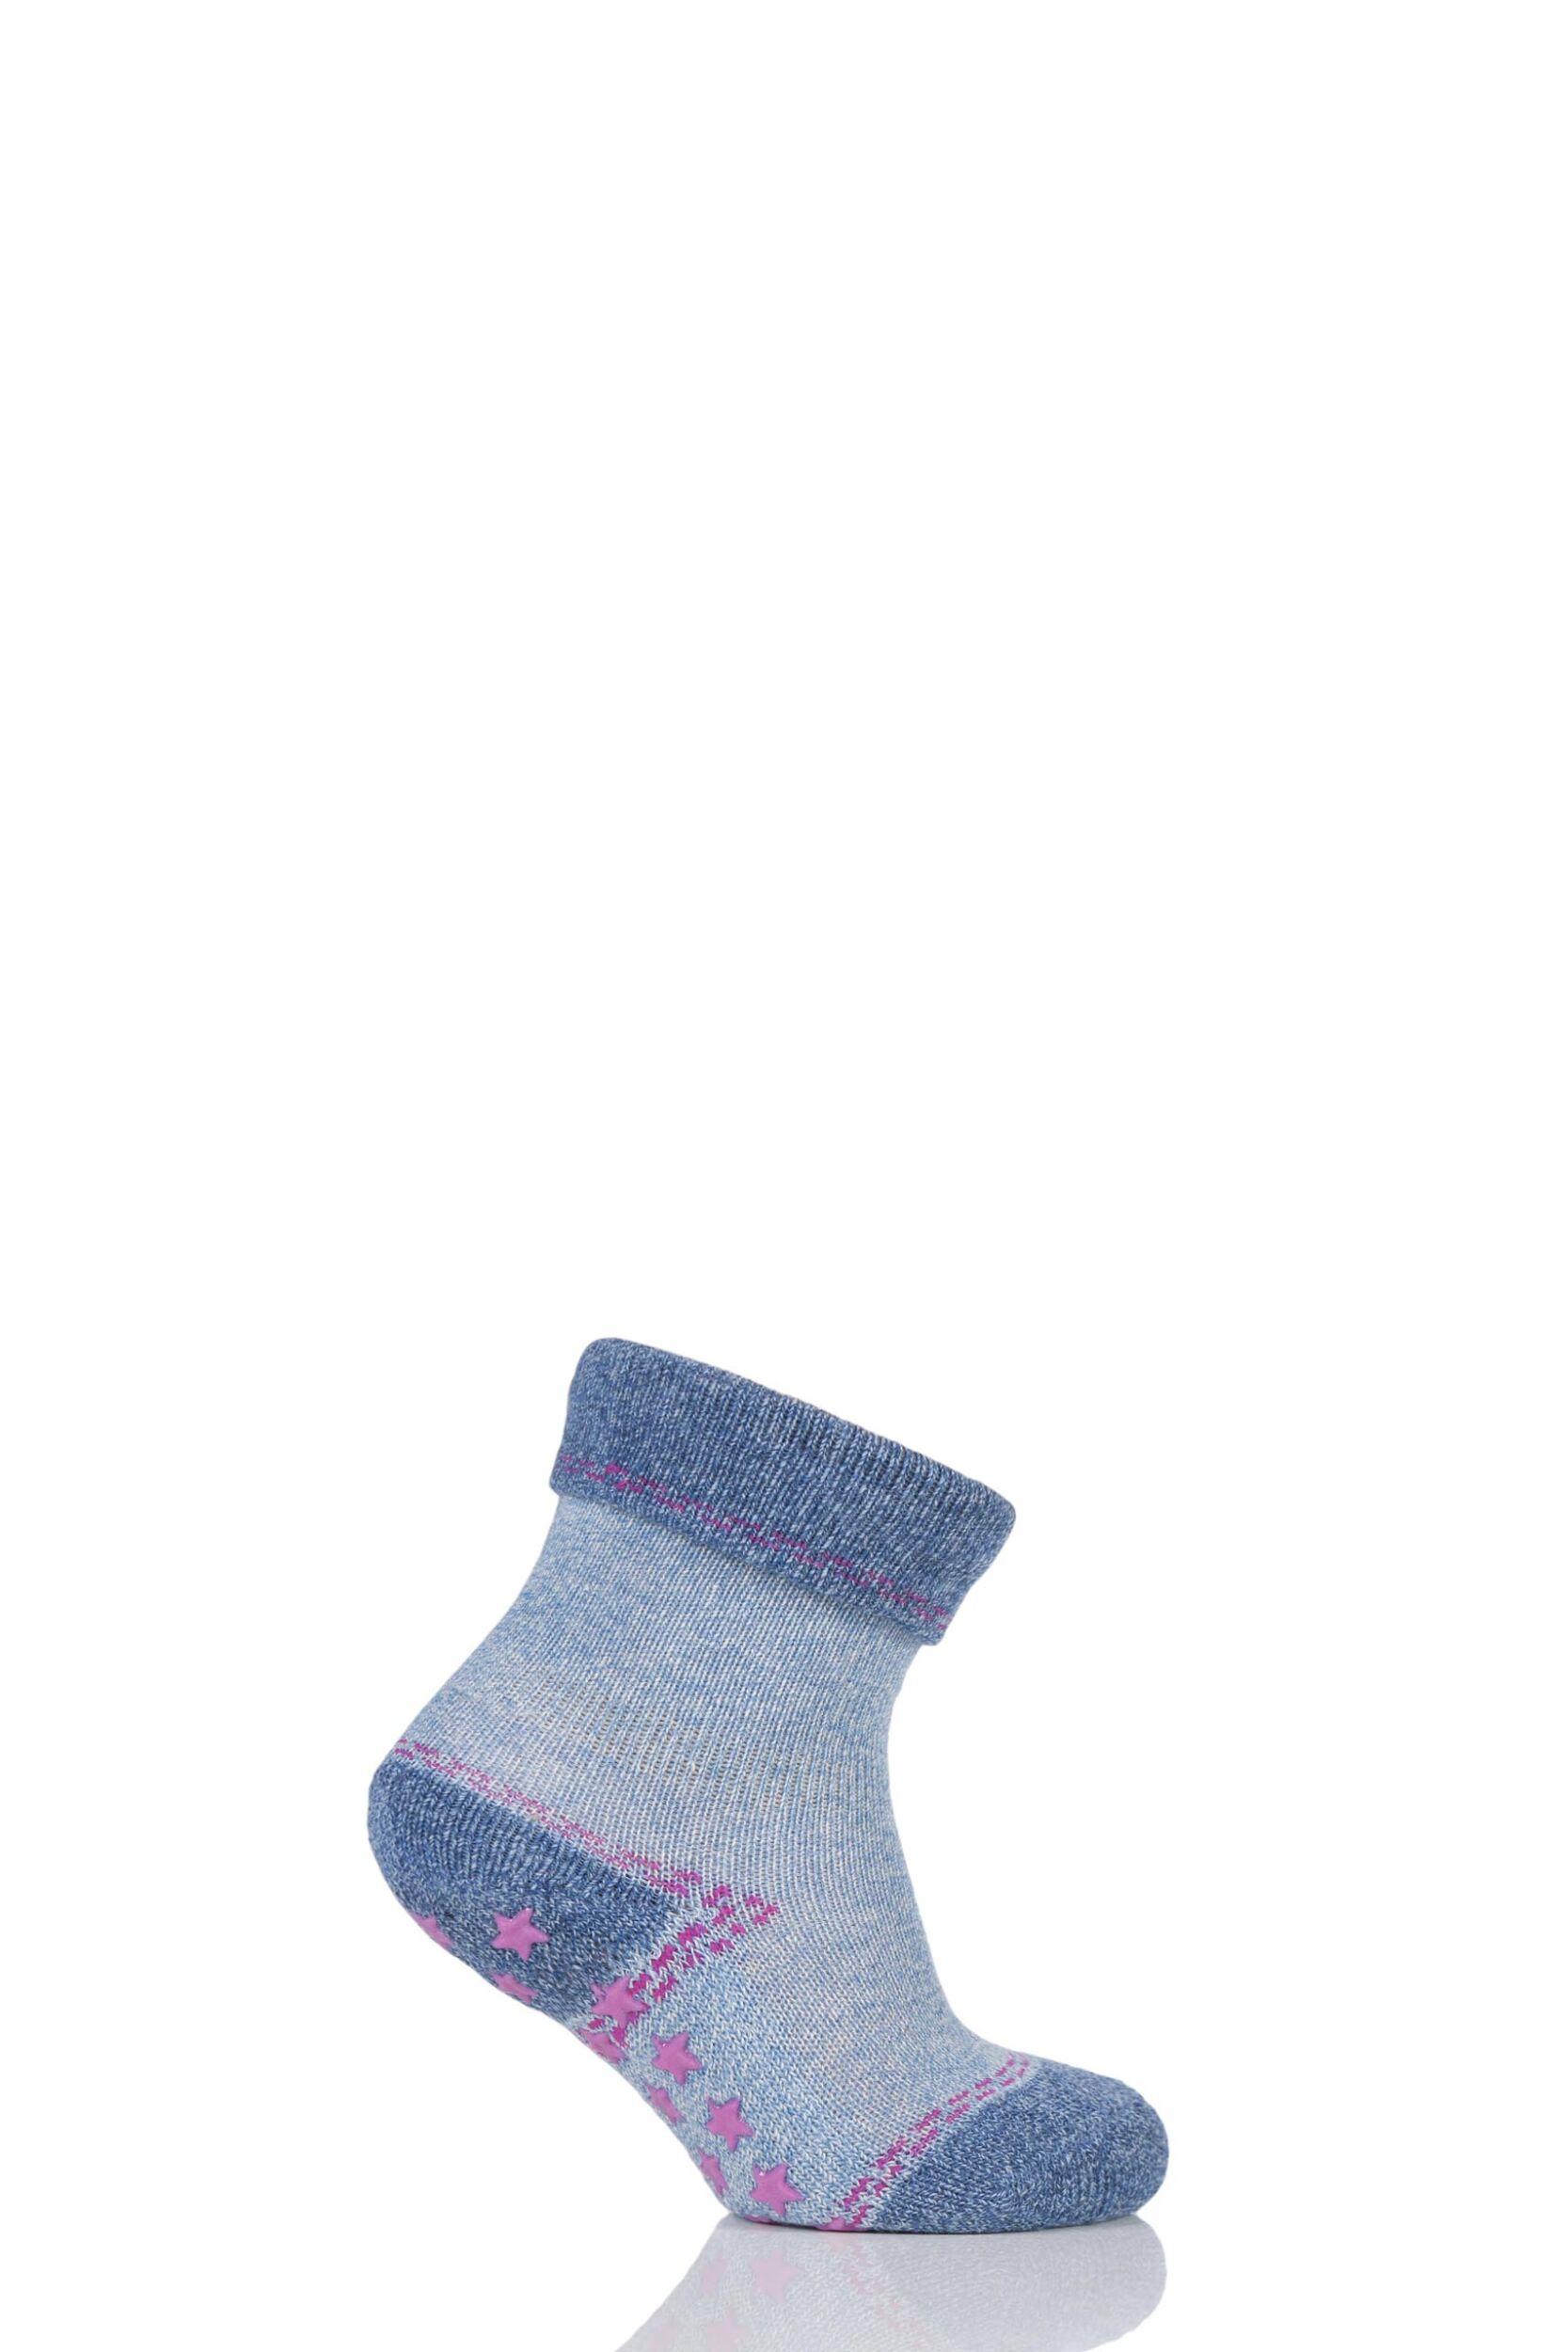 Image of Babies 1 Pair Falke Denim Catspad Socks with Grip